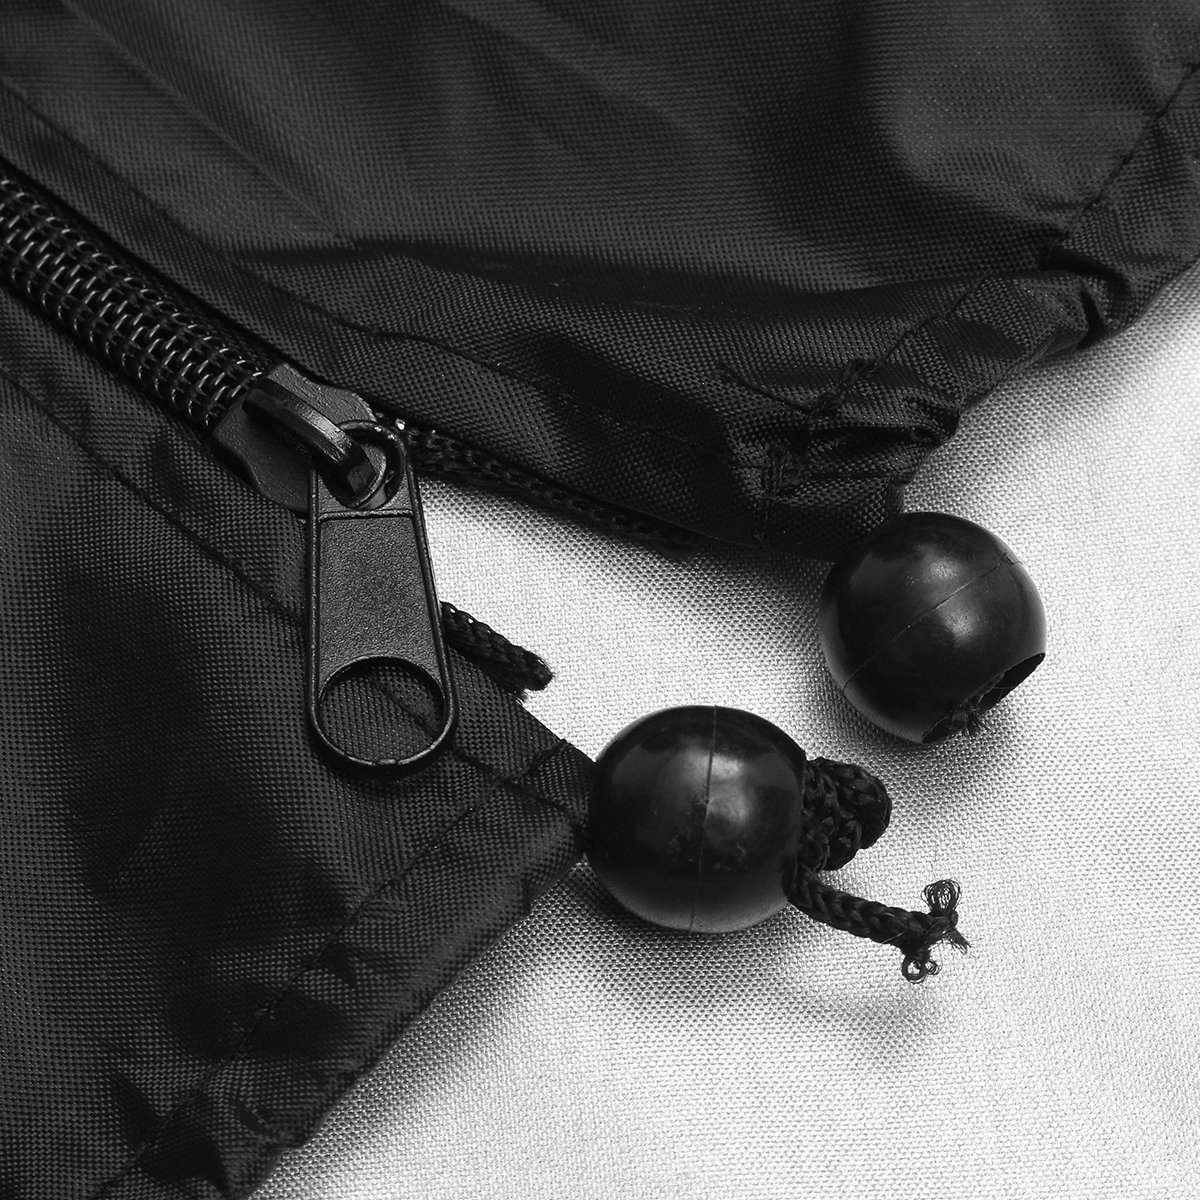 Ddanke 1 Pcs Black Outdoor Patio Umbrella Cover Heavy Duty